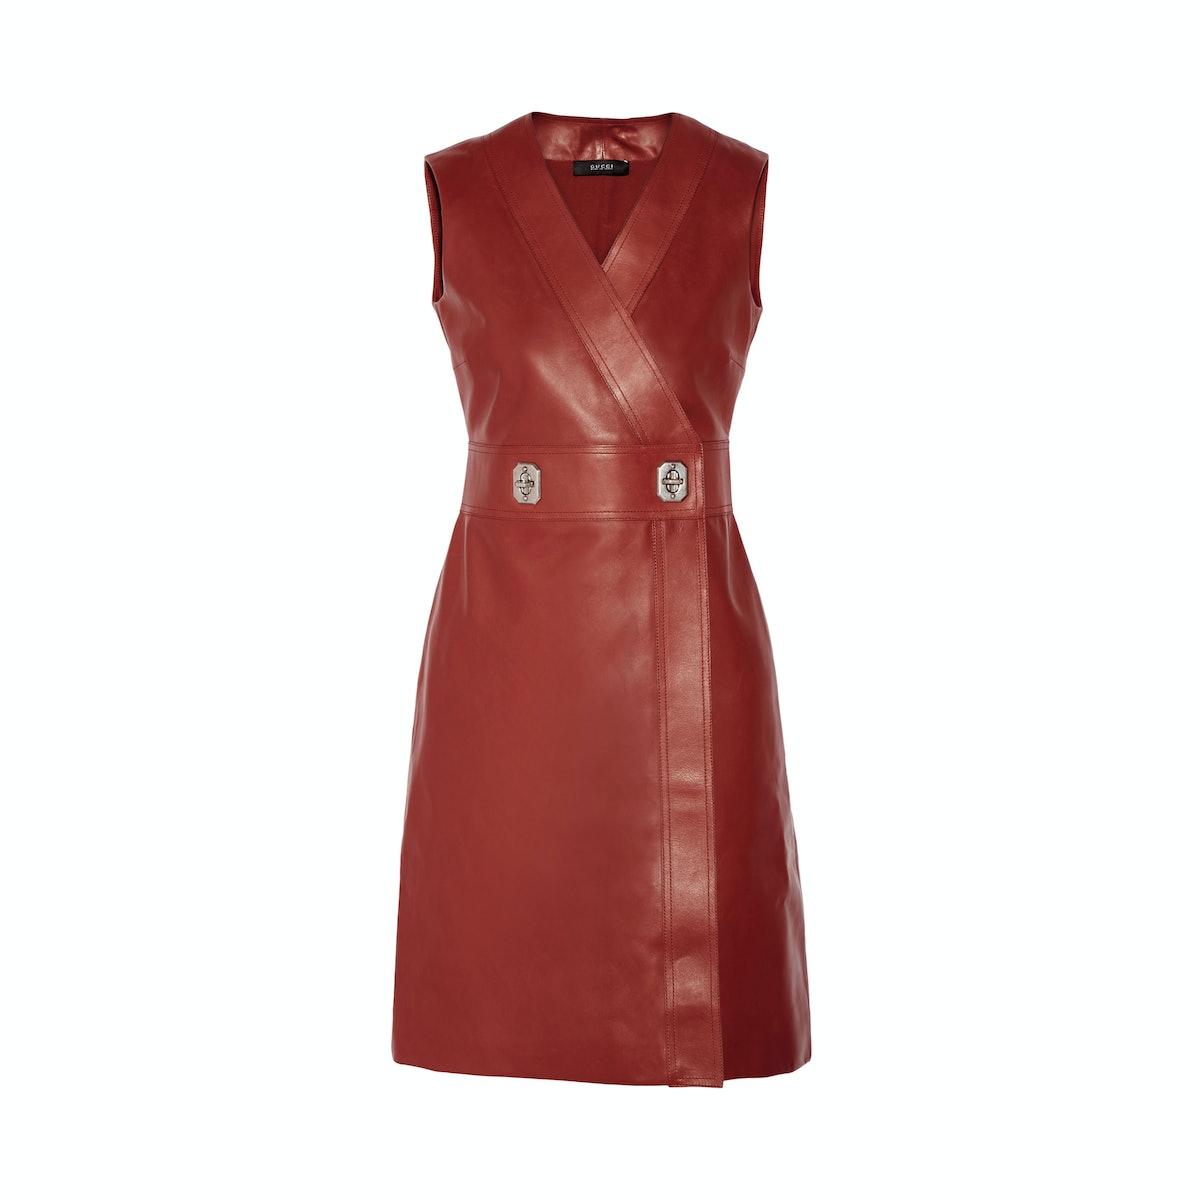 Gucci leather wrap dress